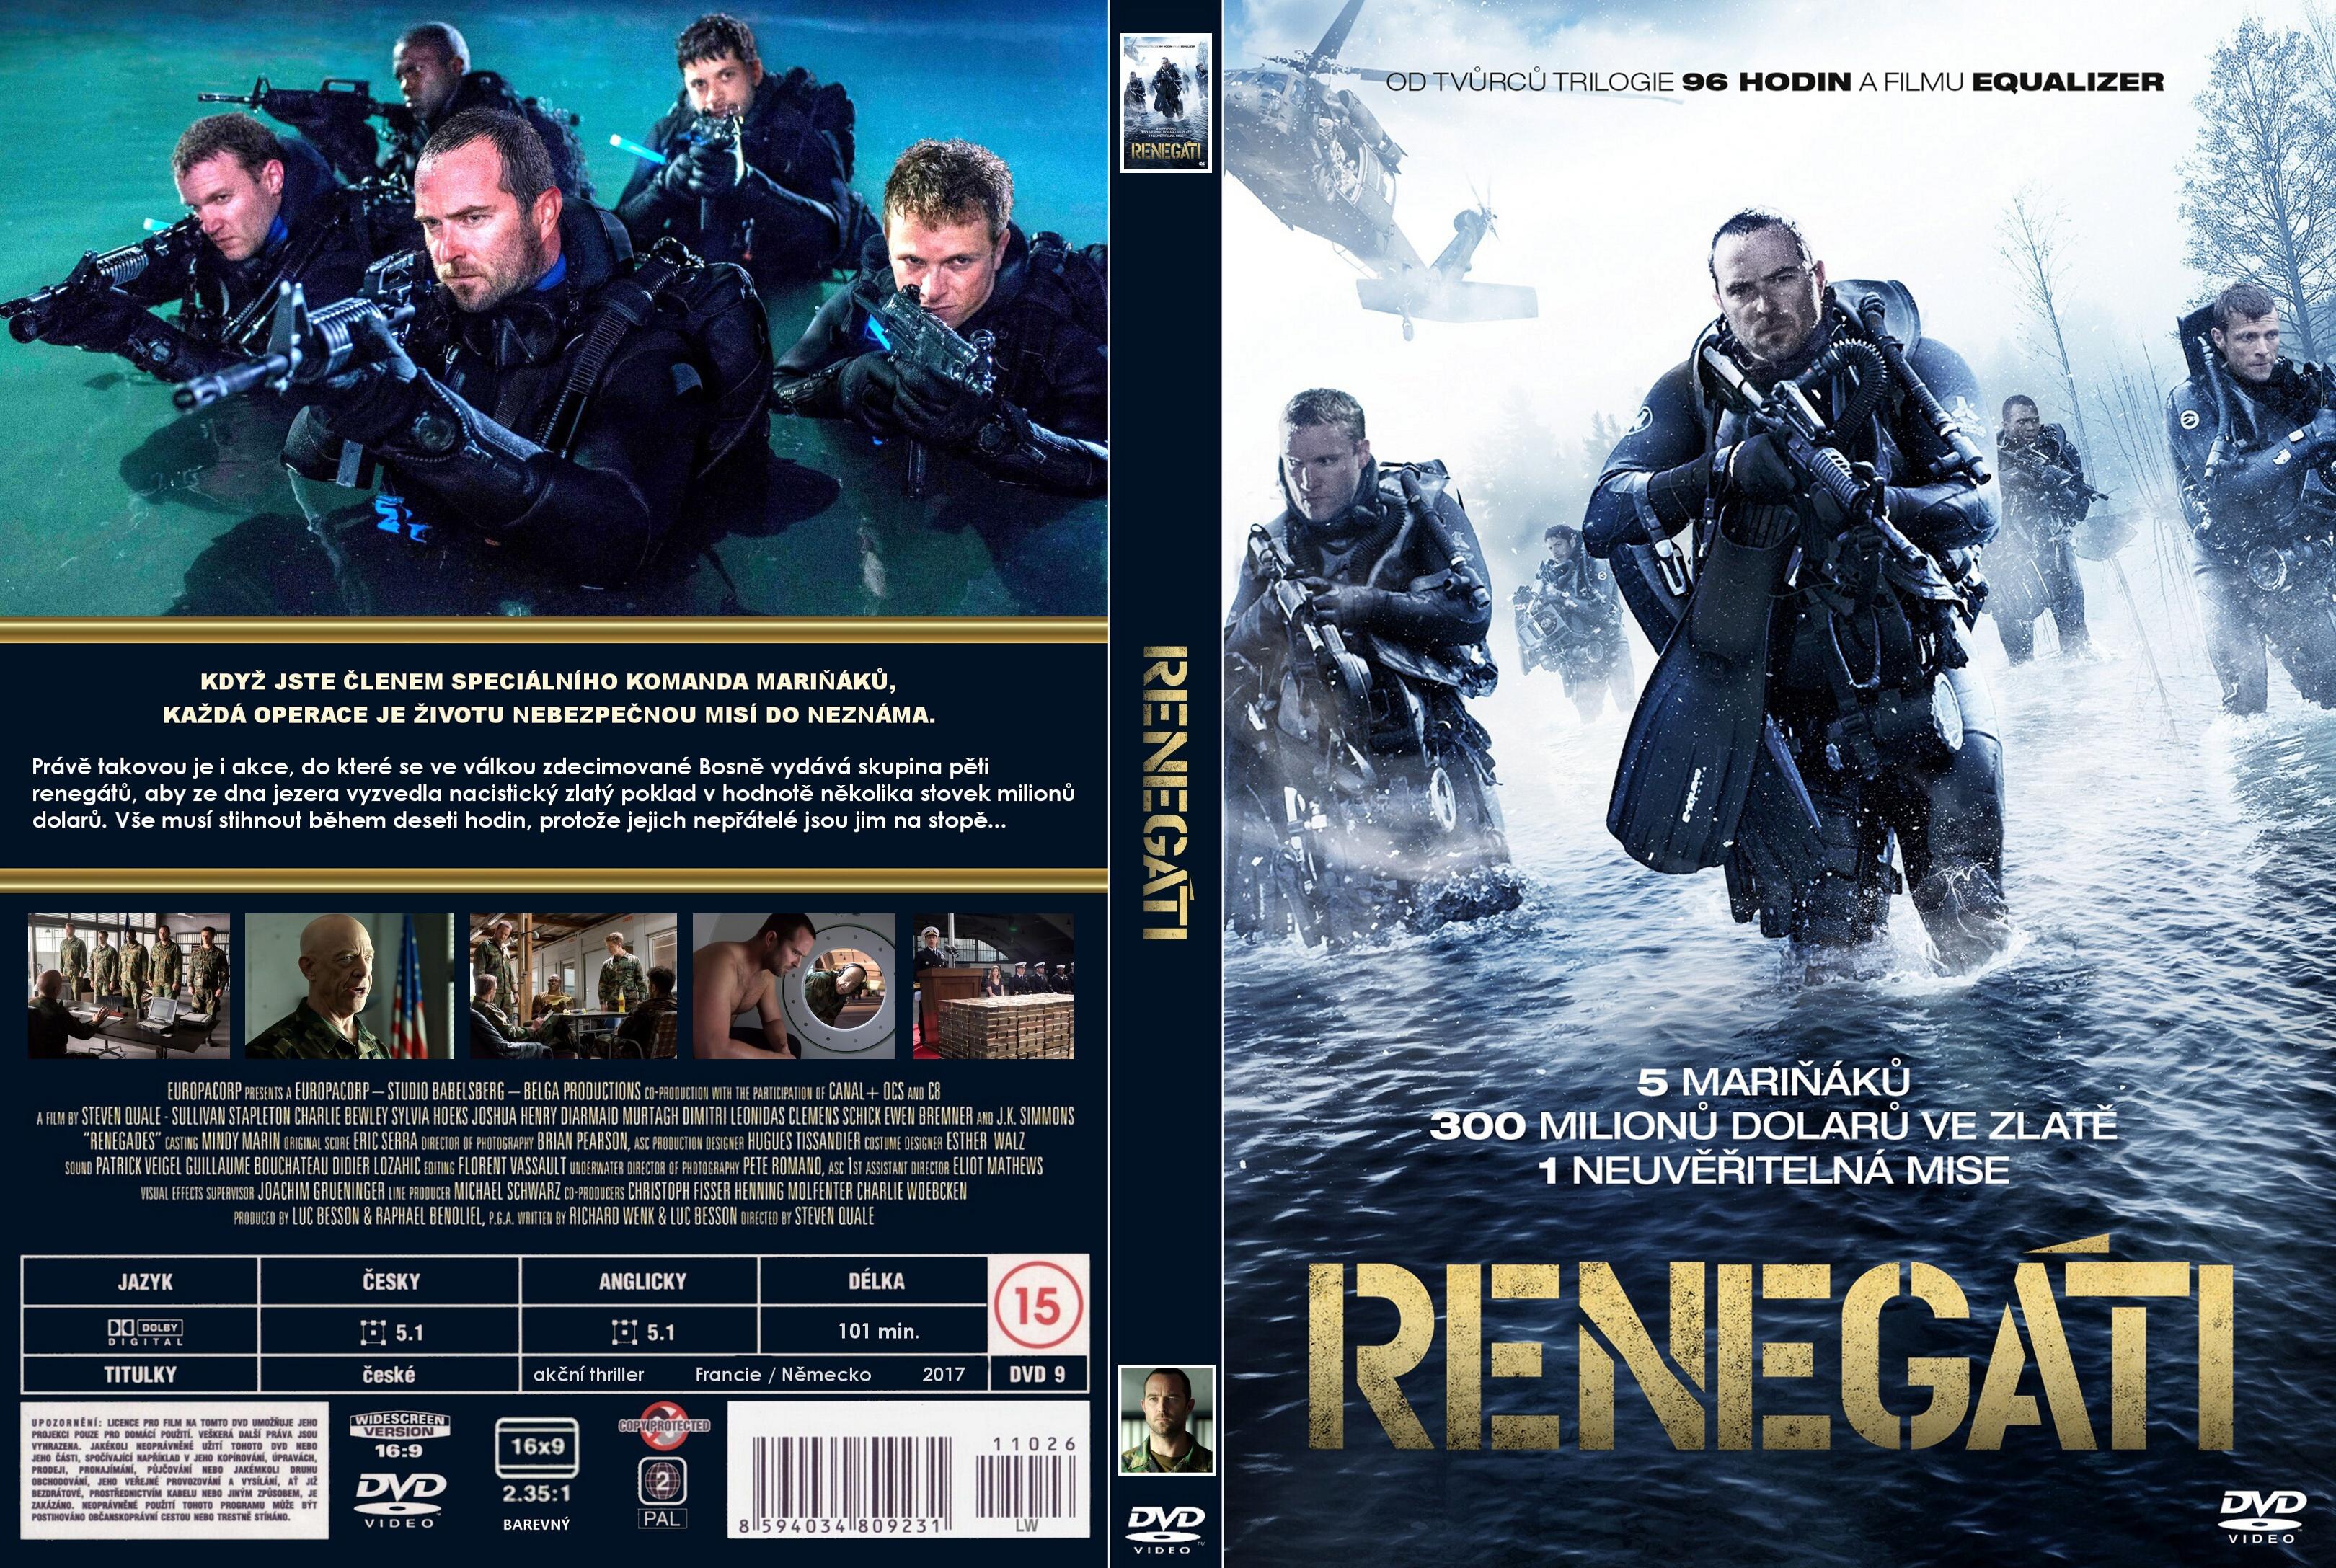 renegades 2017 movie dvd